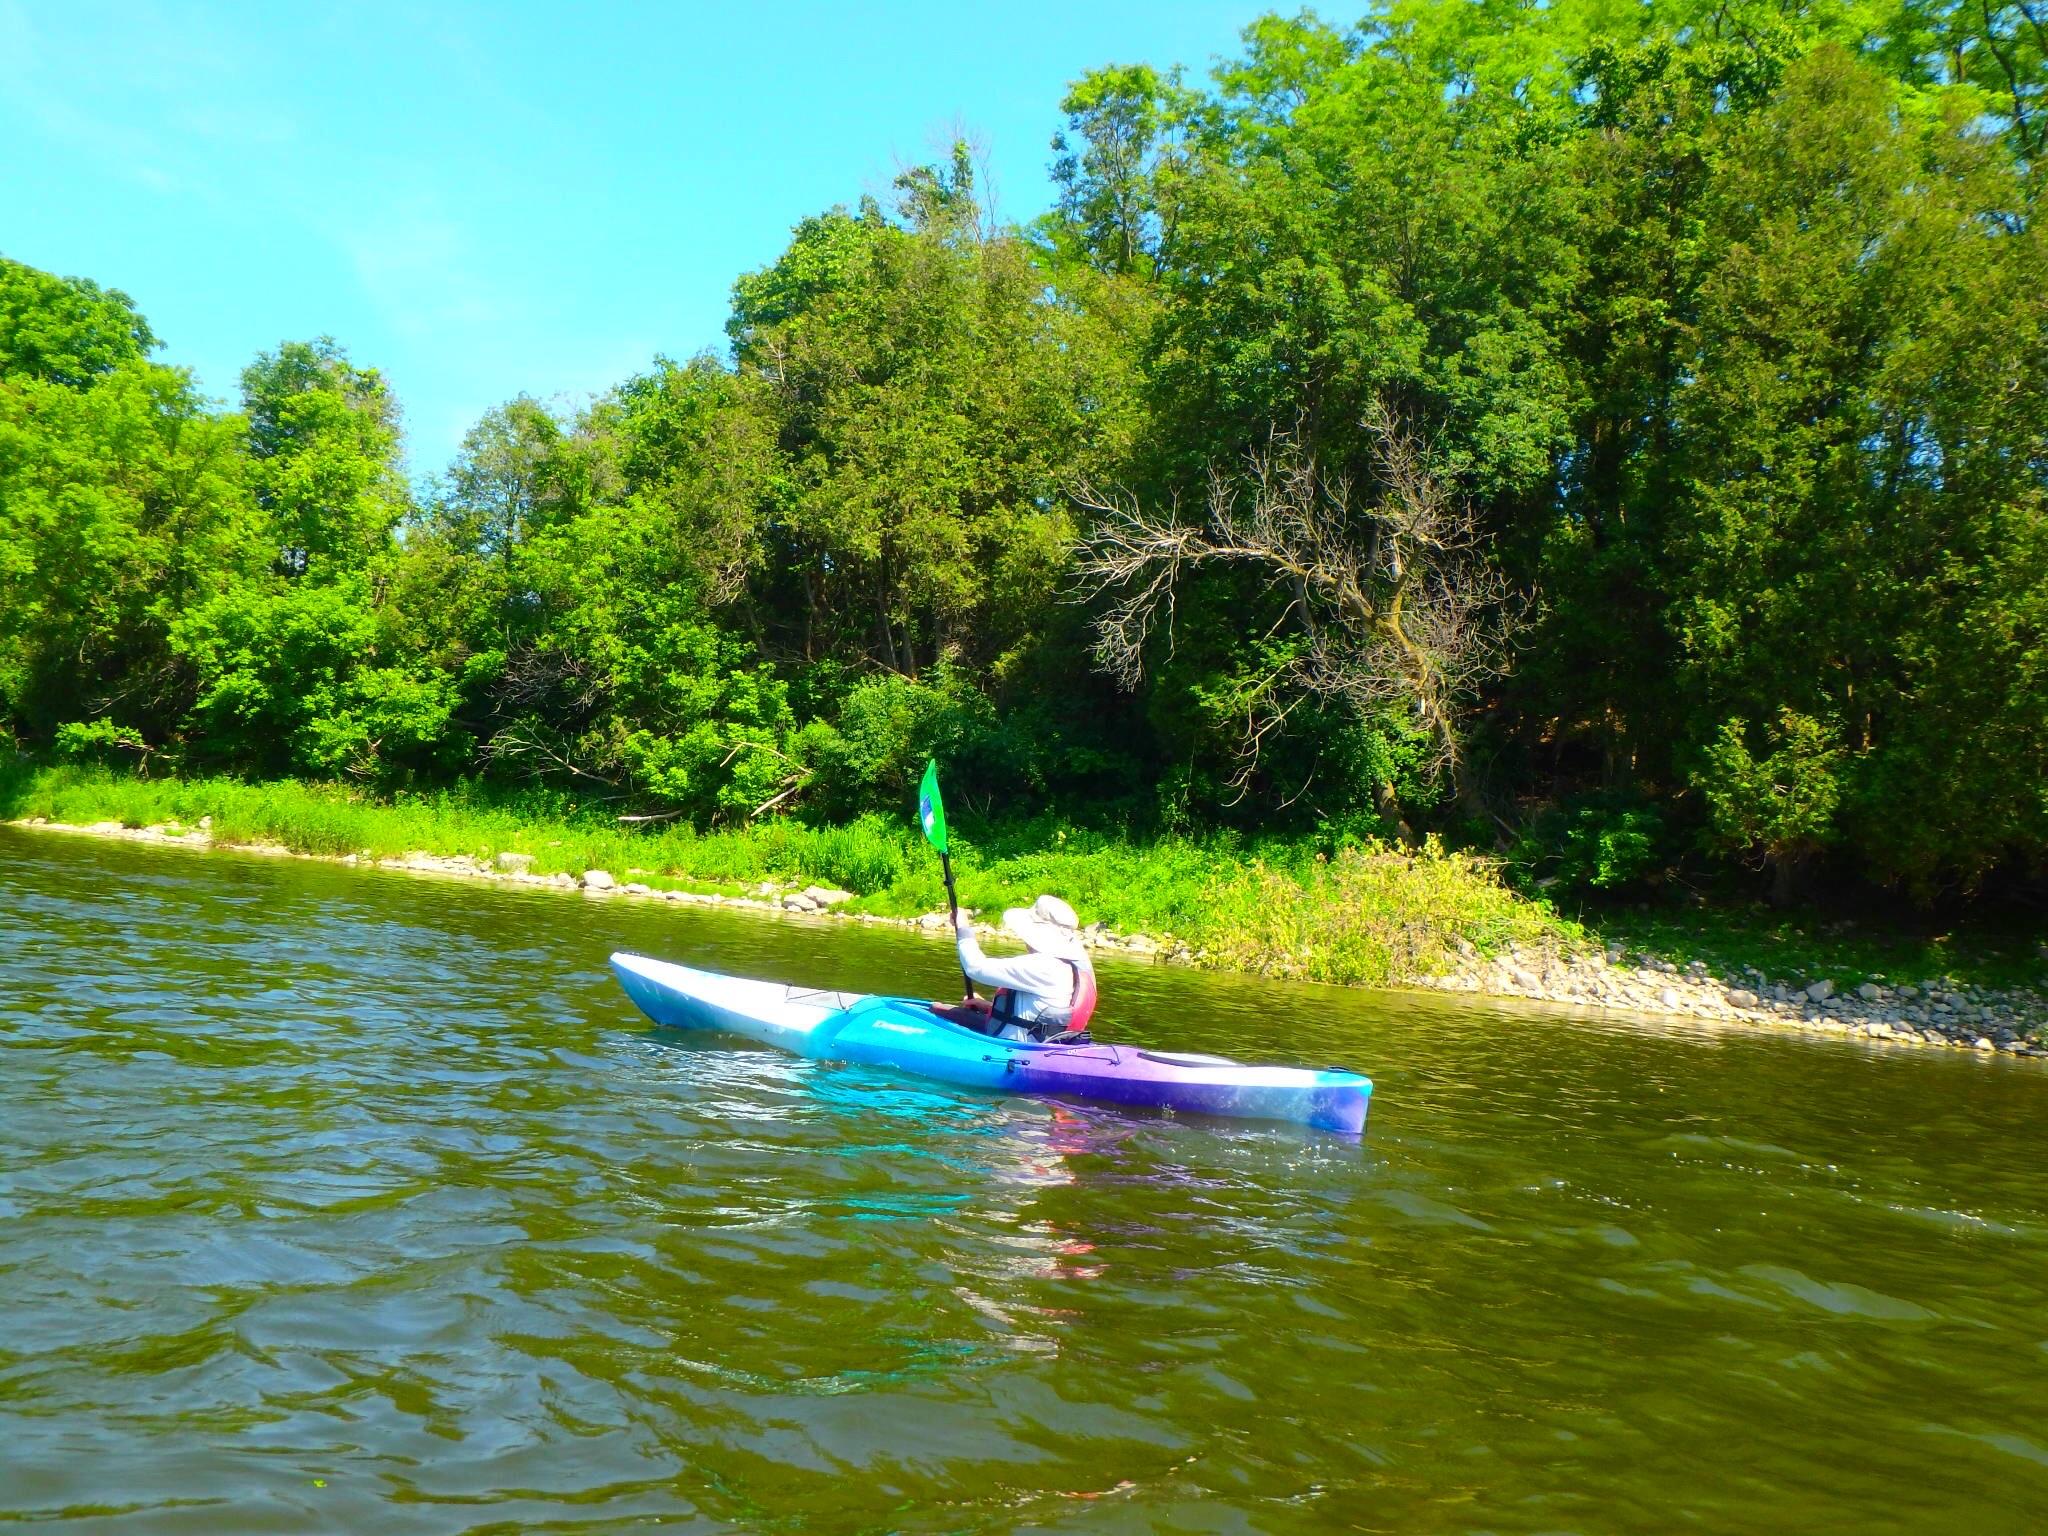 Kayaking Yoga Meditation - Solstice - Jun 21 2018-76